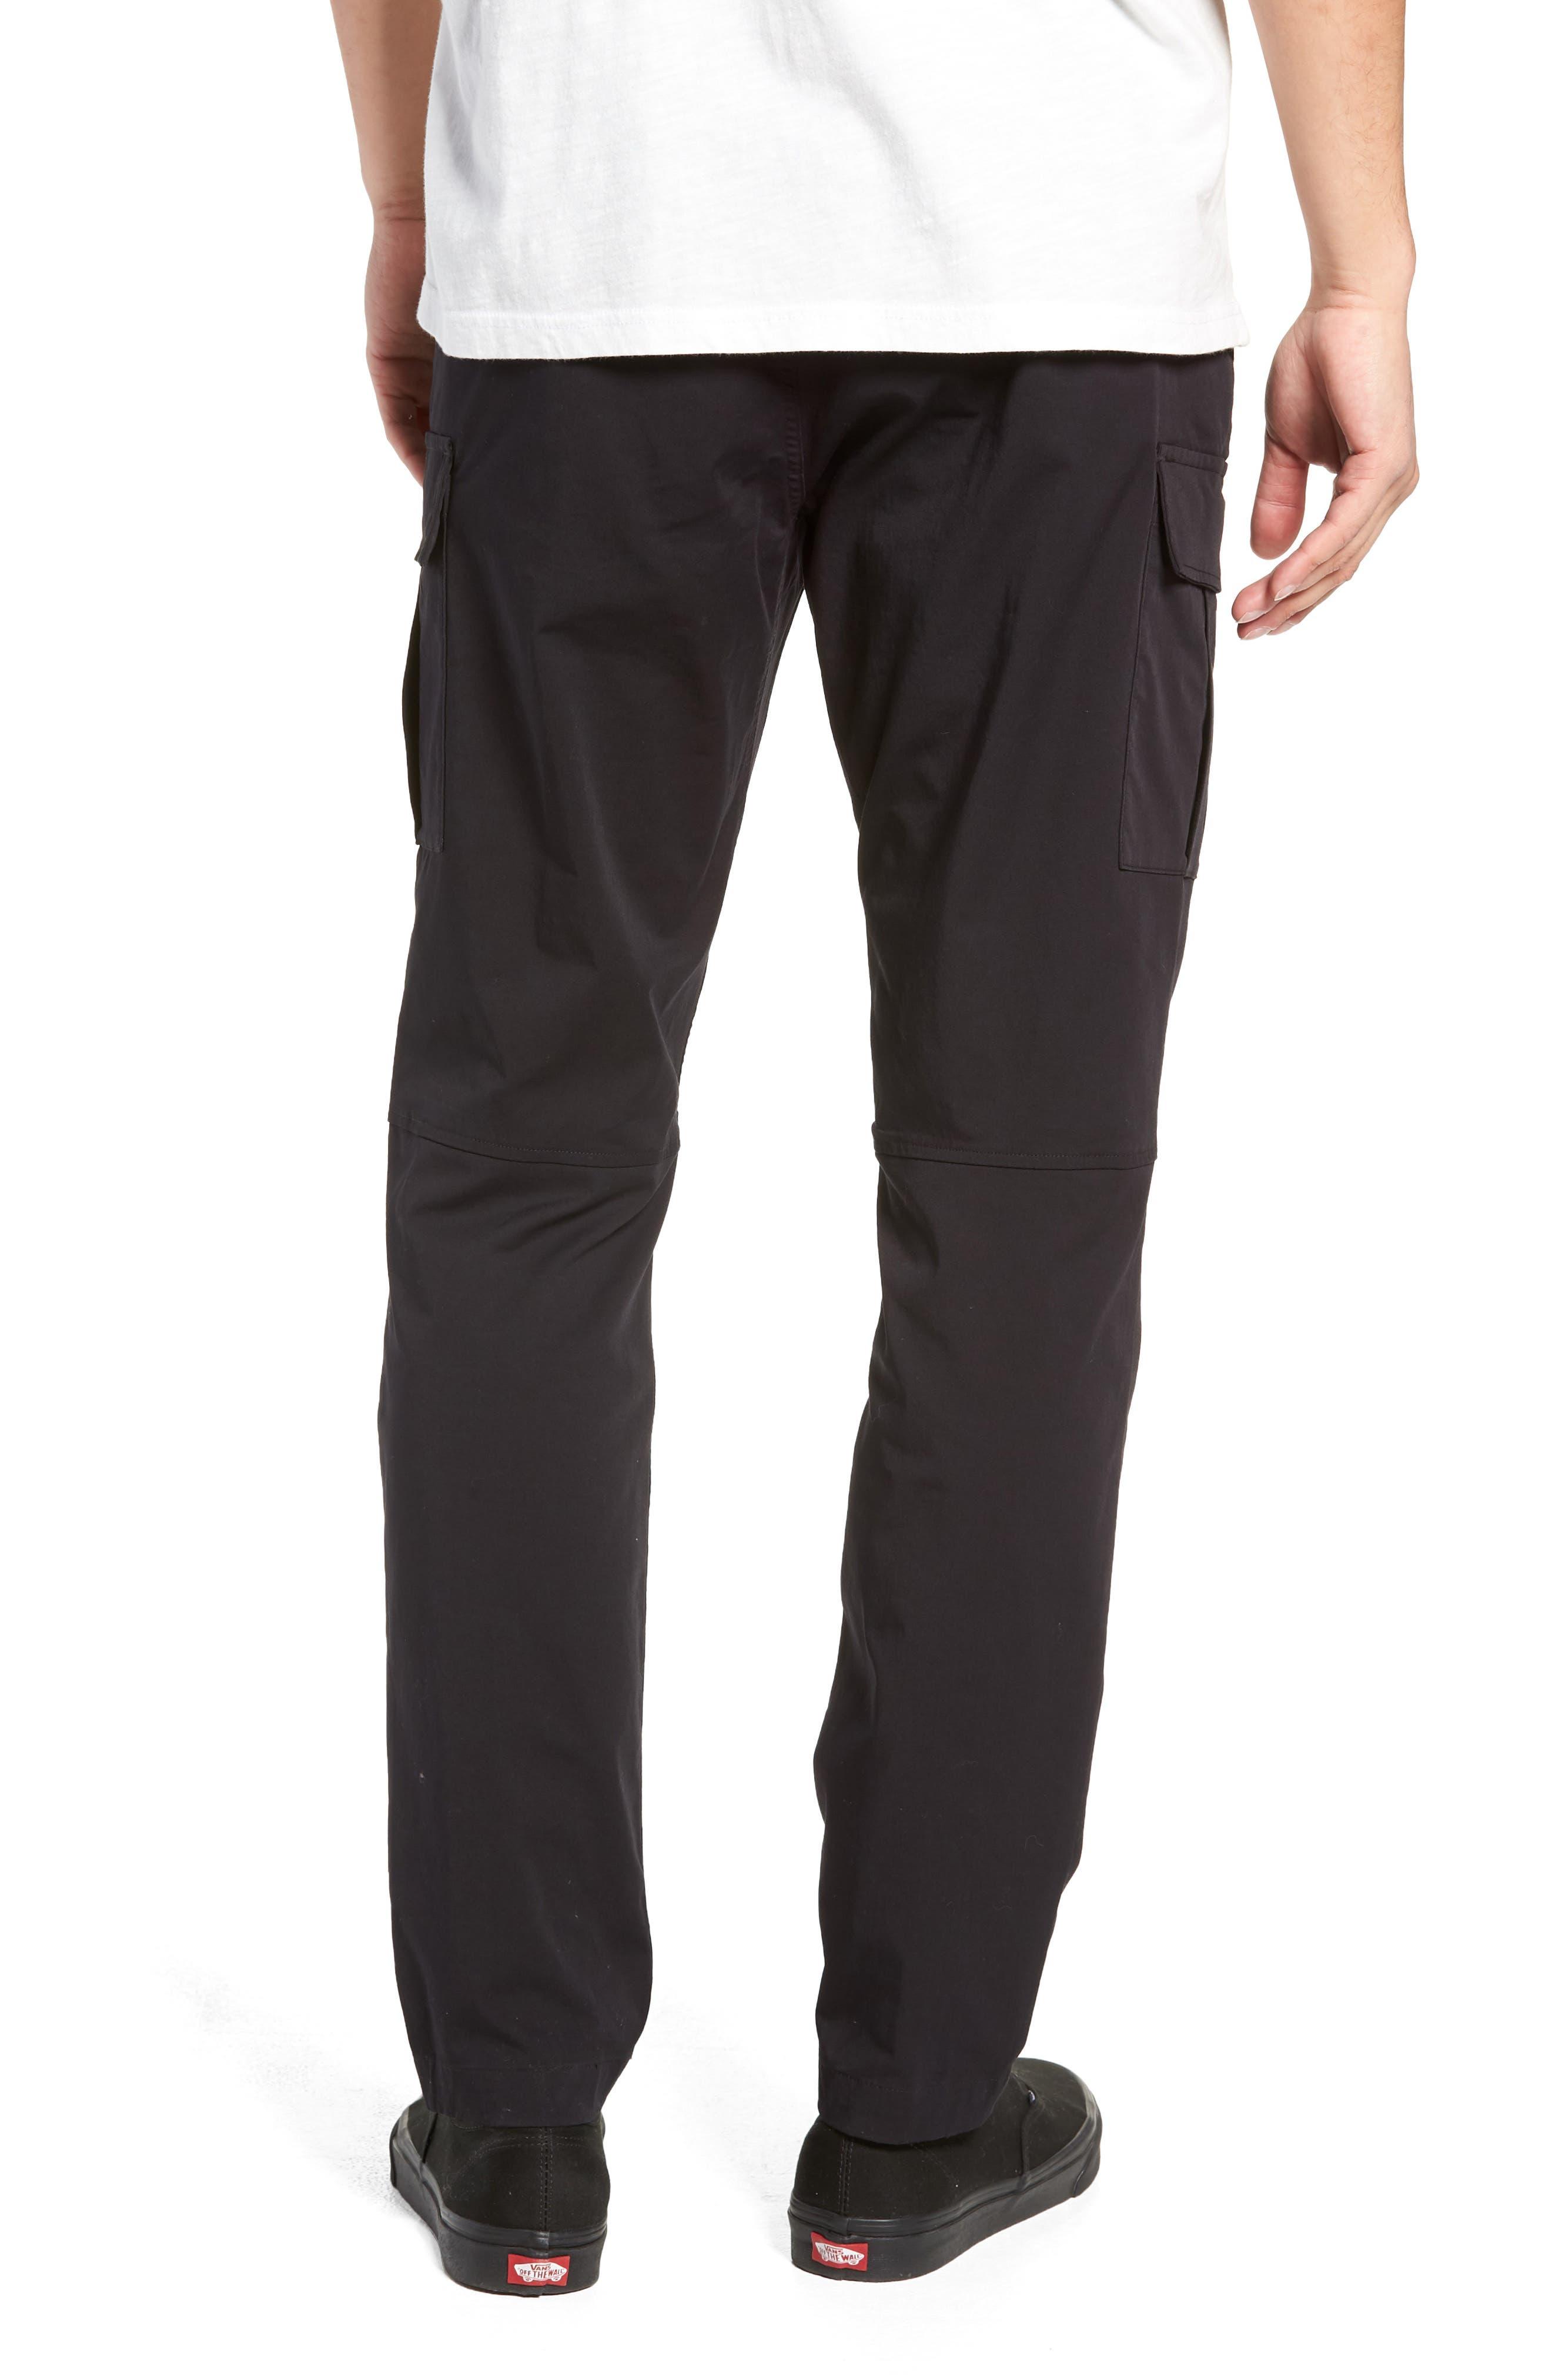 Cordura Slim Fit Cargo Pants,                             Alternate thumbnail 2, color,                             BLACK